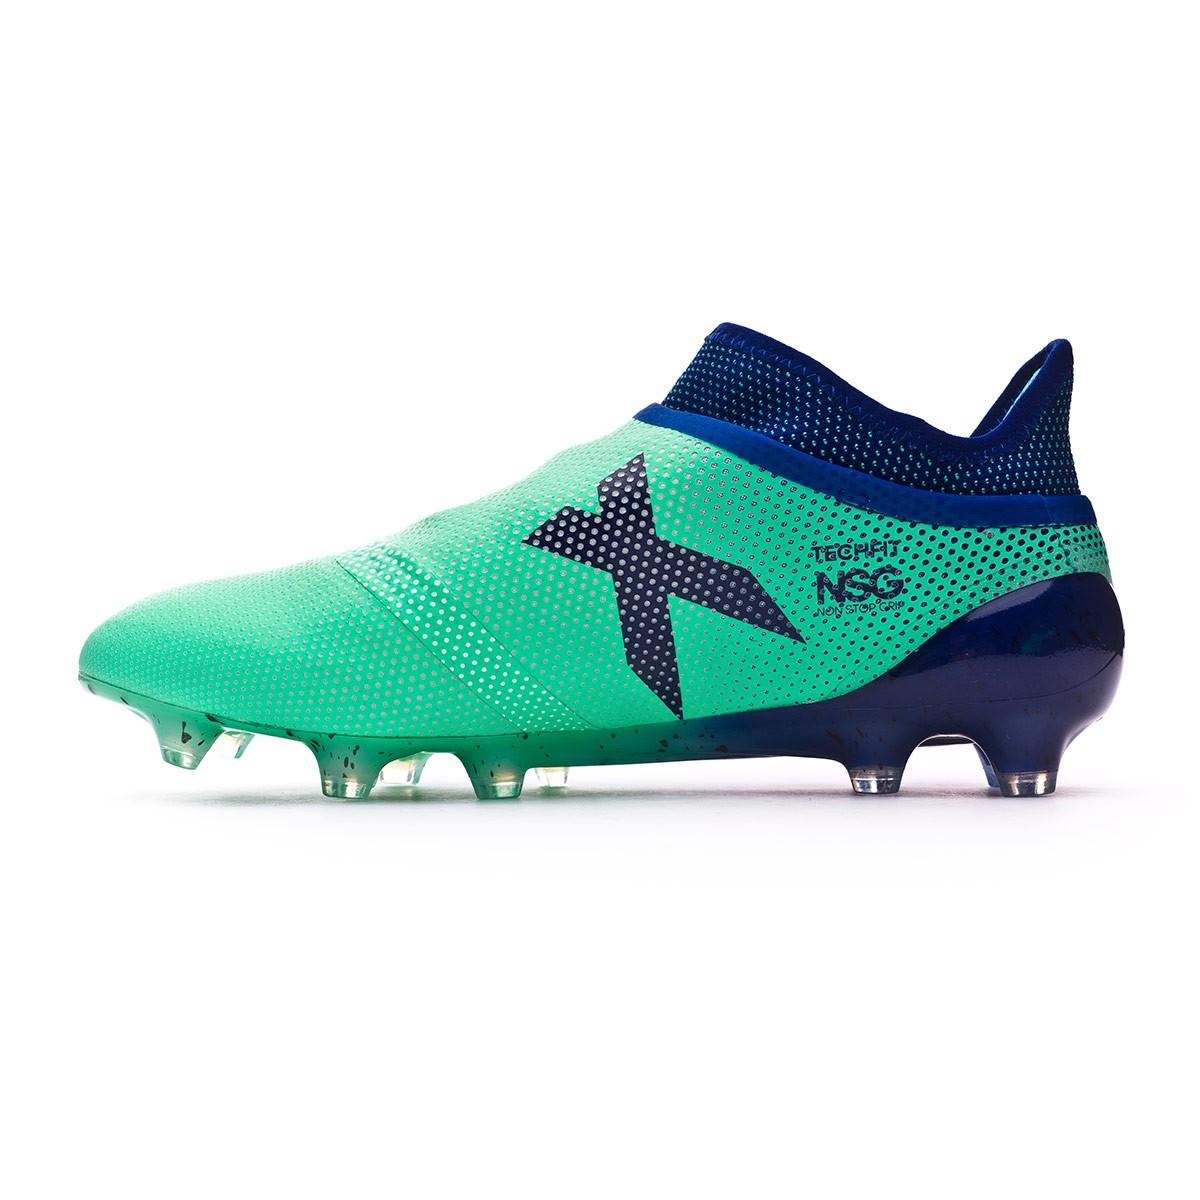 069a8f39d6658 Bota de fútbol adidas X 17+ Purespeed FG Aero green-Unity ink-Hi-res green  - Tienda de fútbol Fútbol Emotion